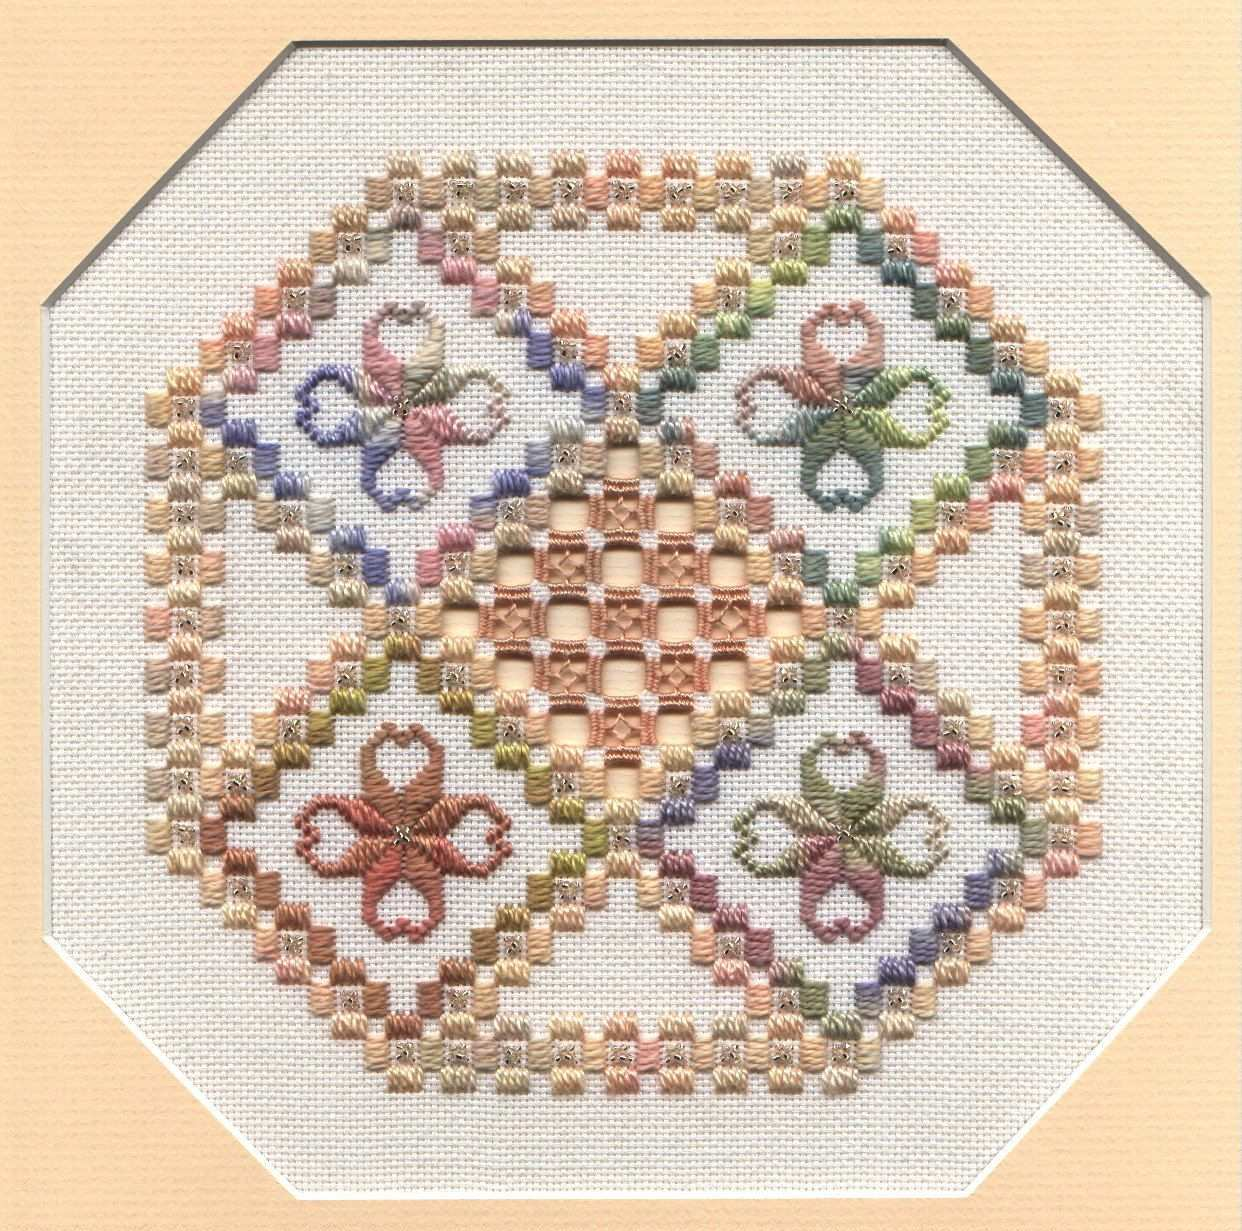 Jahreszeiten Hardanger Muster Hardanger Embroidery Hardanger Pattern